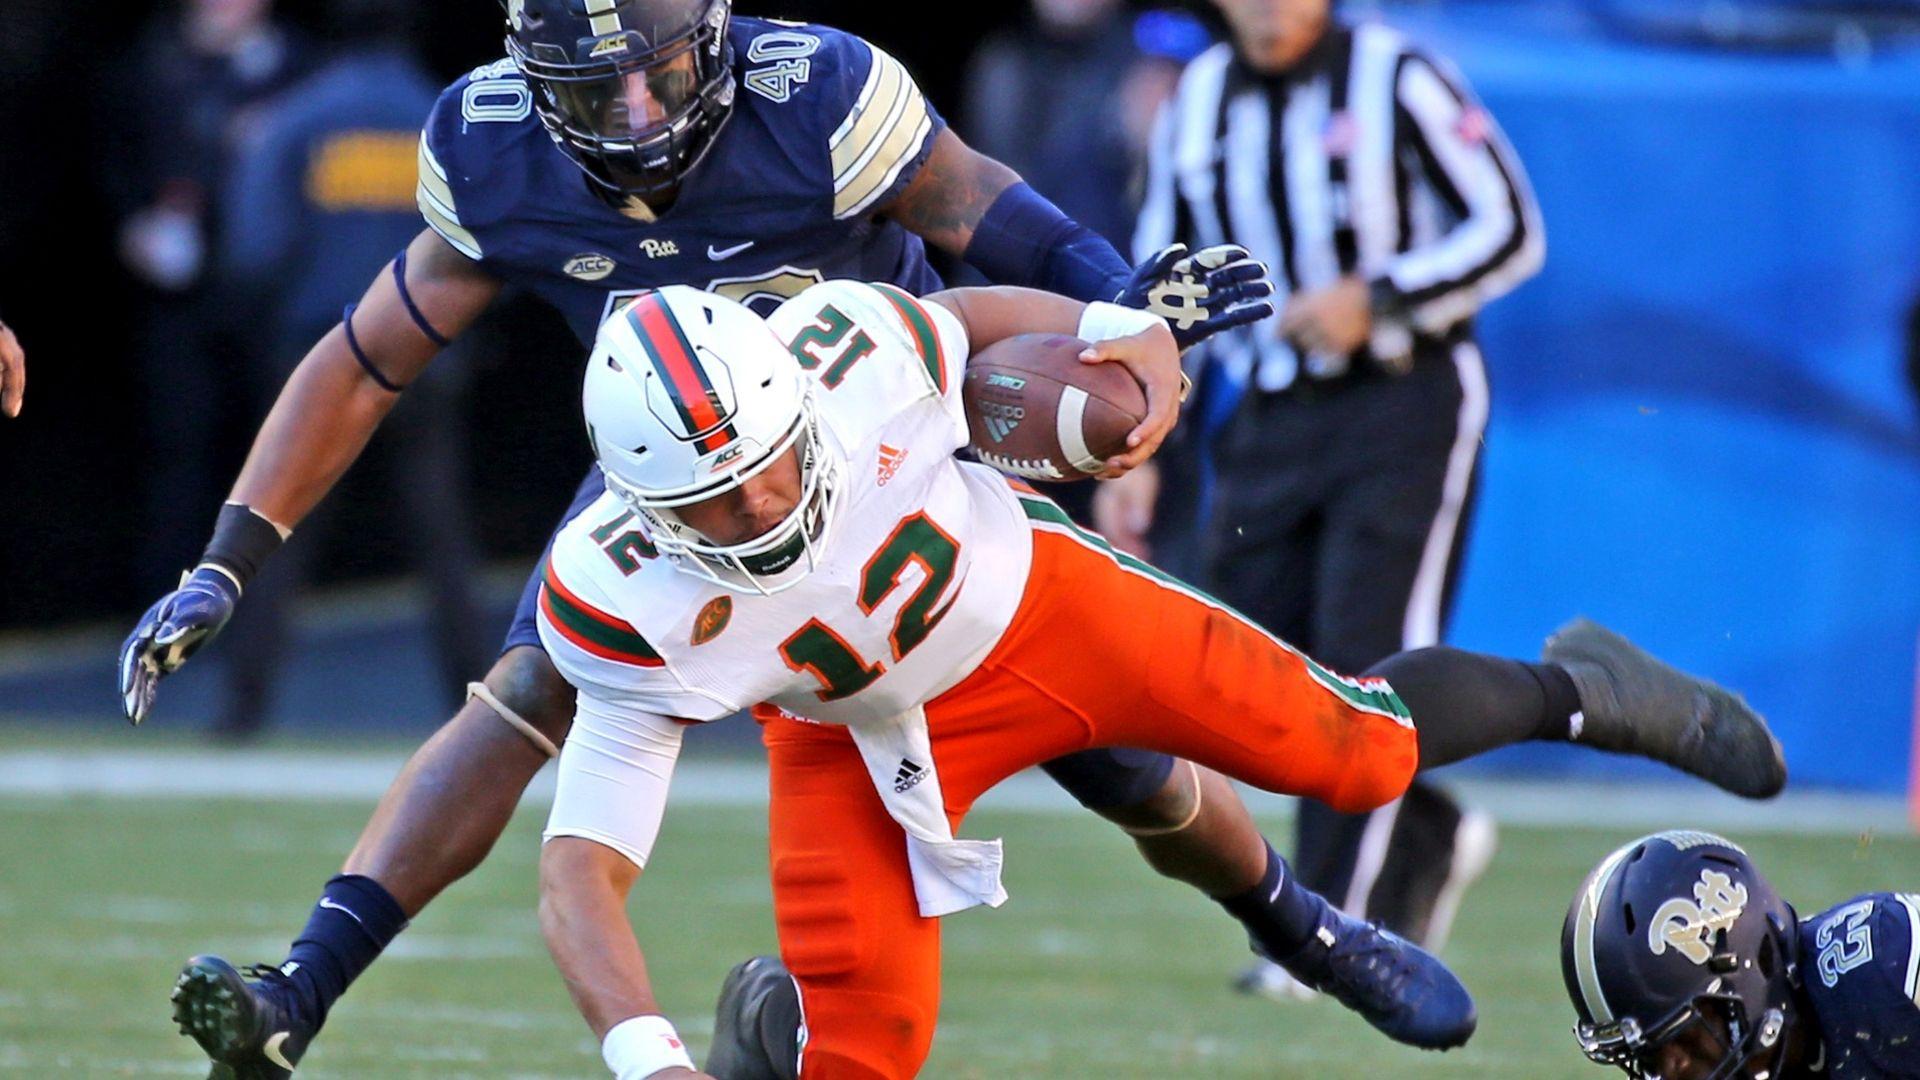 Pitt's upset of No.2 Miami is history repeated